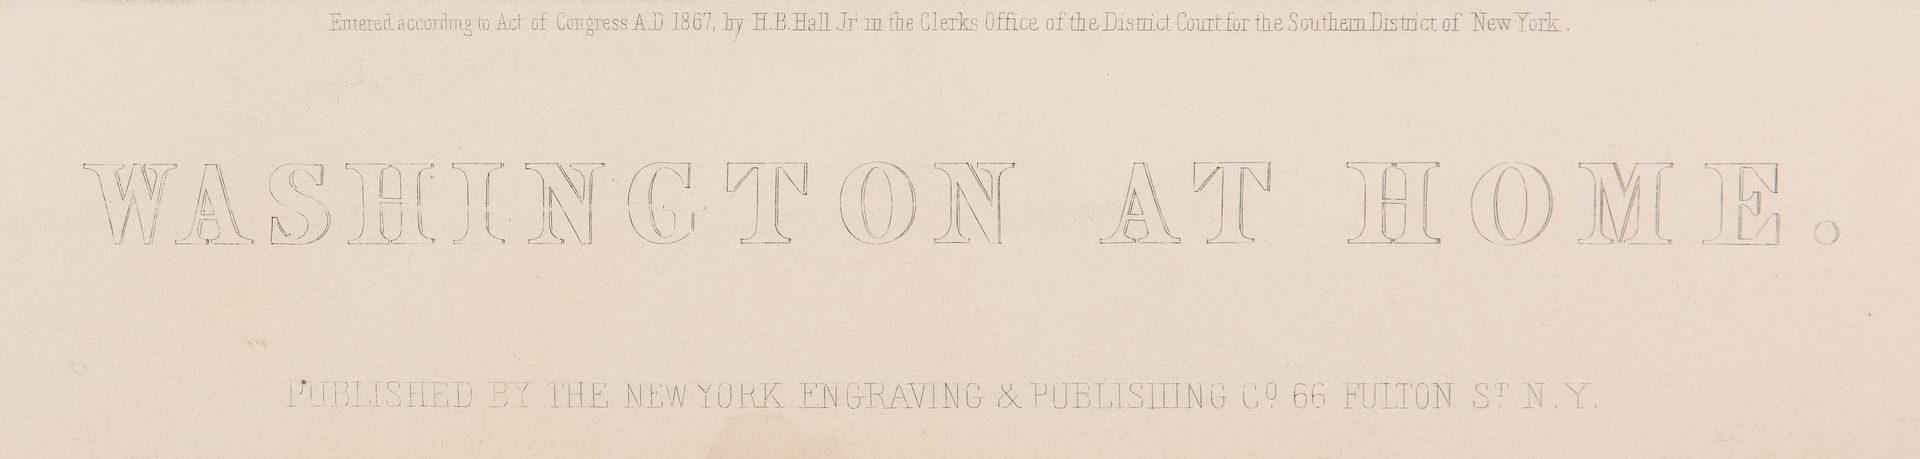 Lot 304: 2 George Washington Prints, incl. Washington At Home